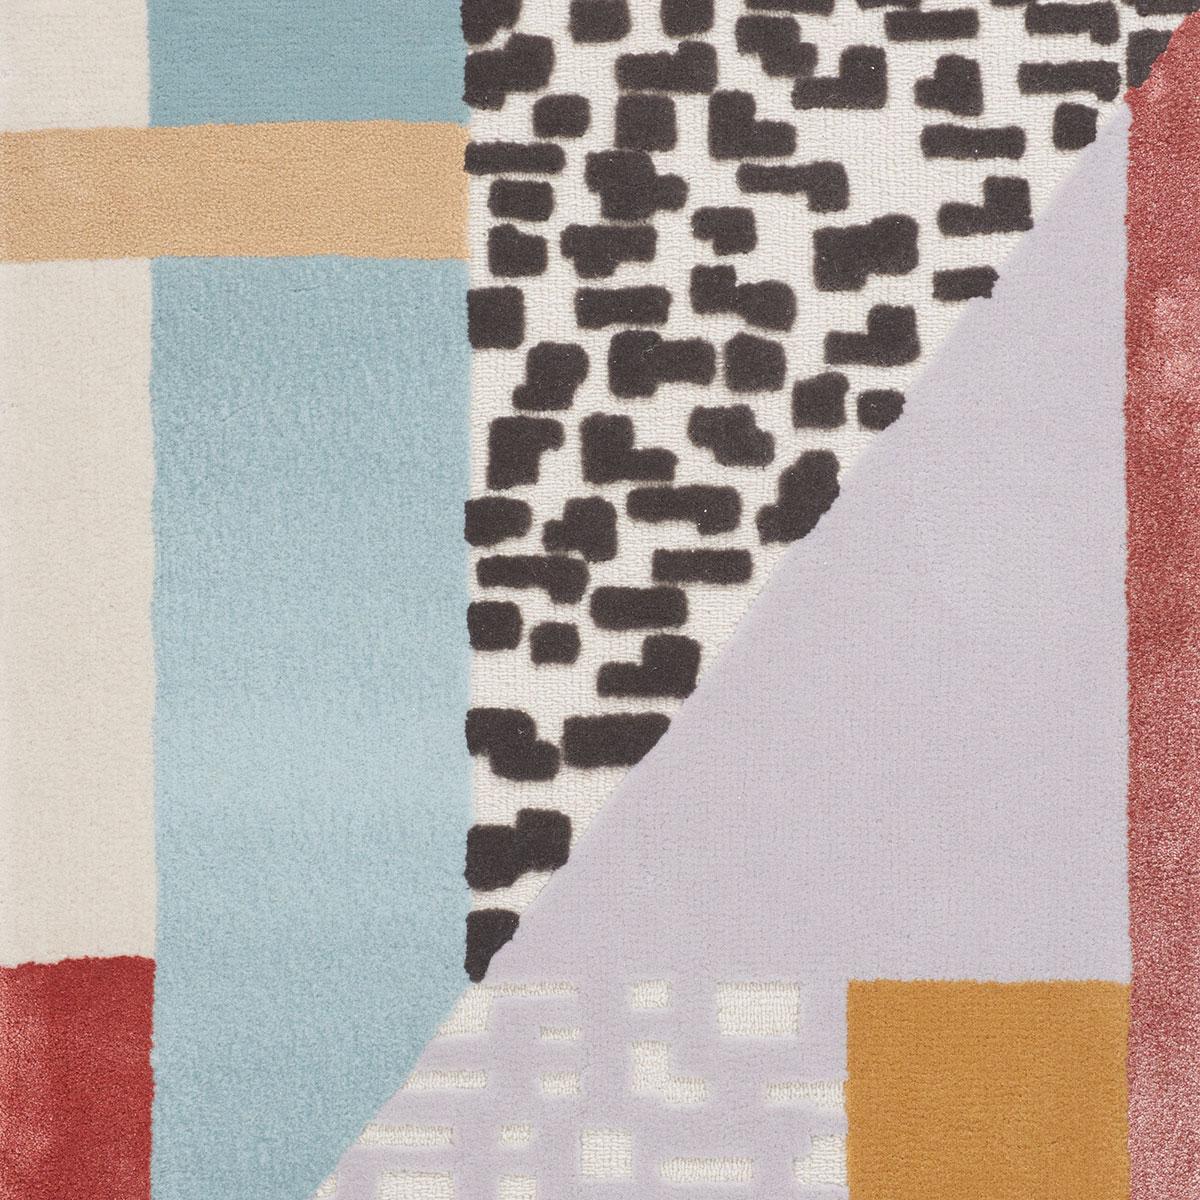 ratio_wool-silk_hand-tufted_patterson-flynn-martin_pfm